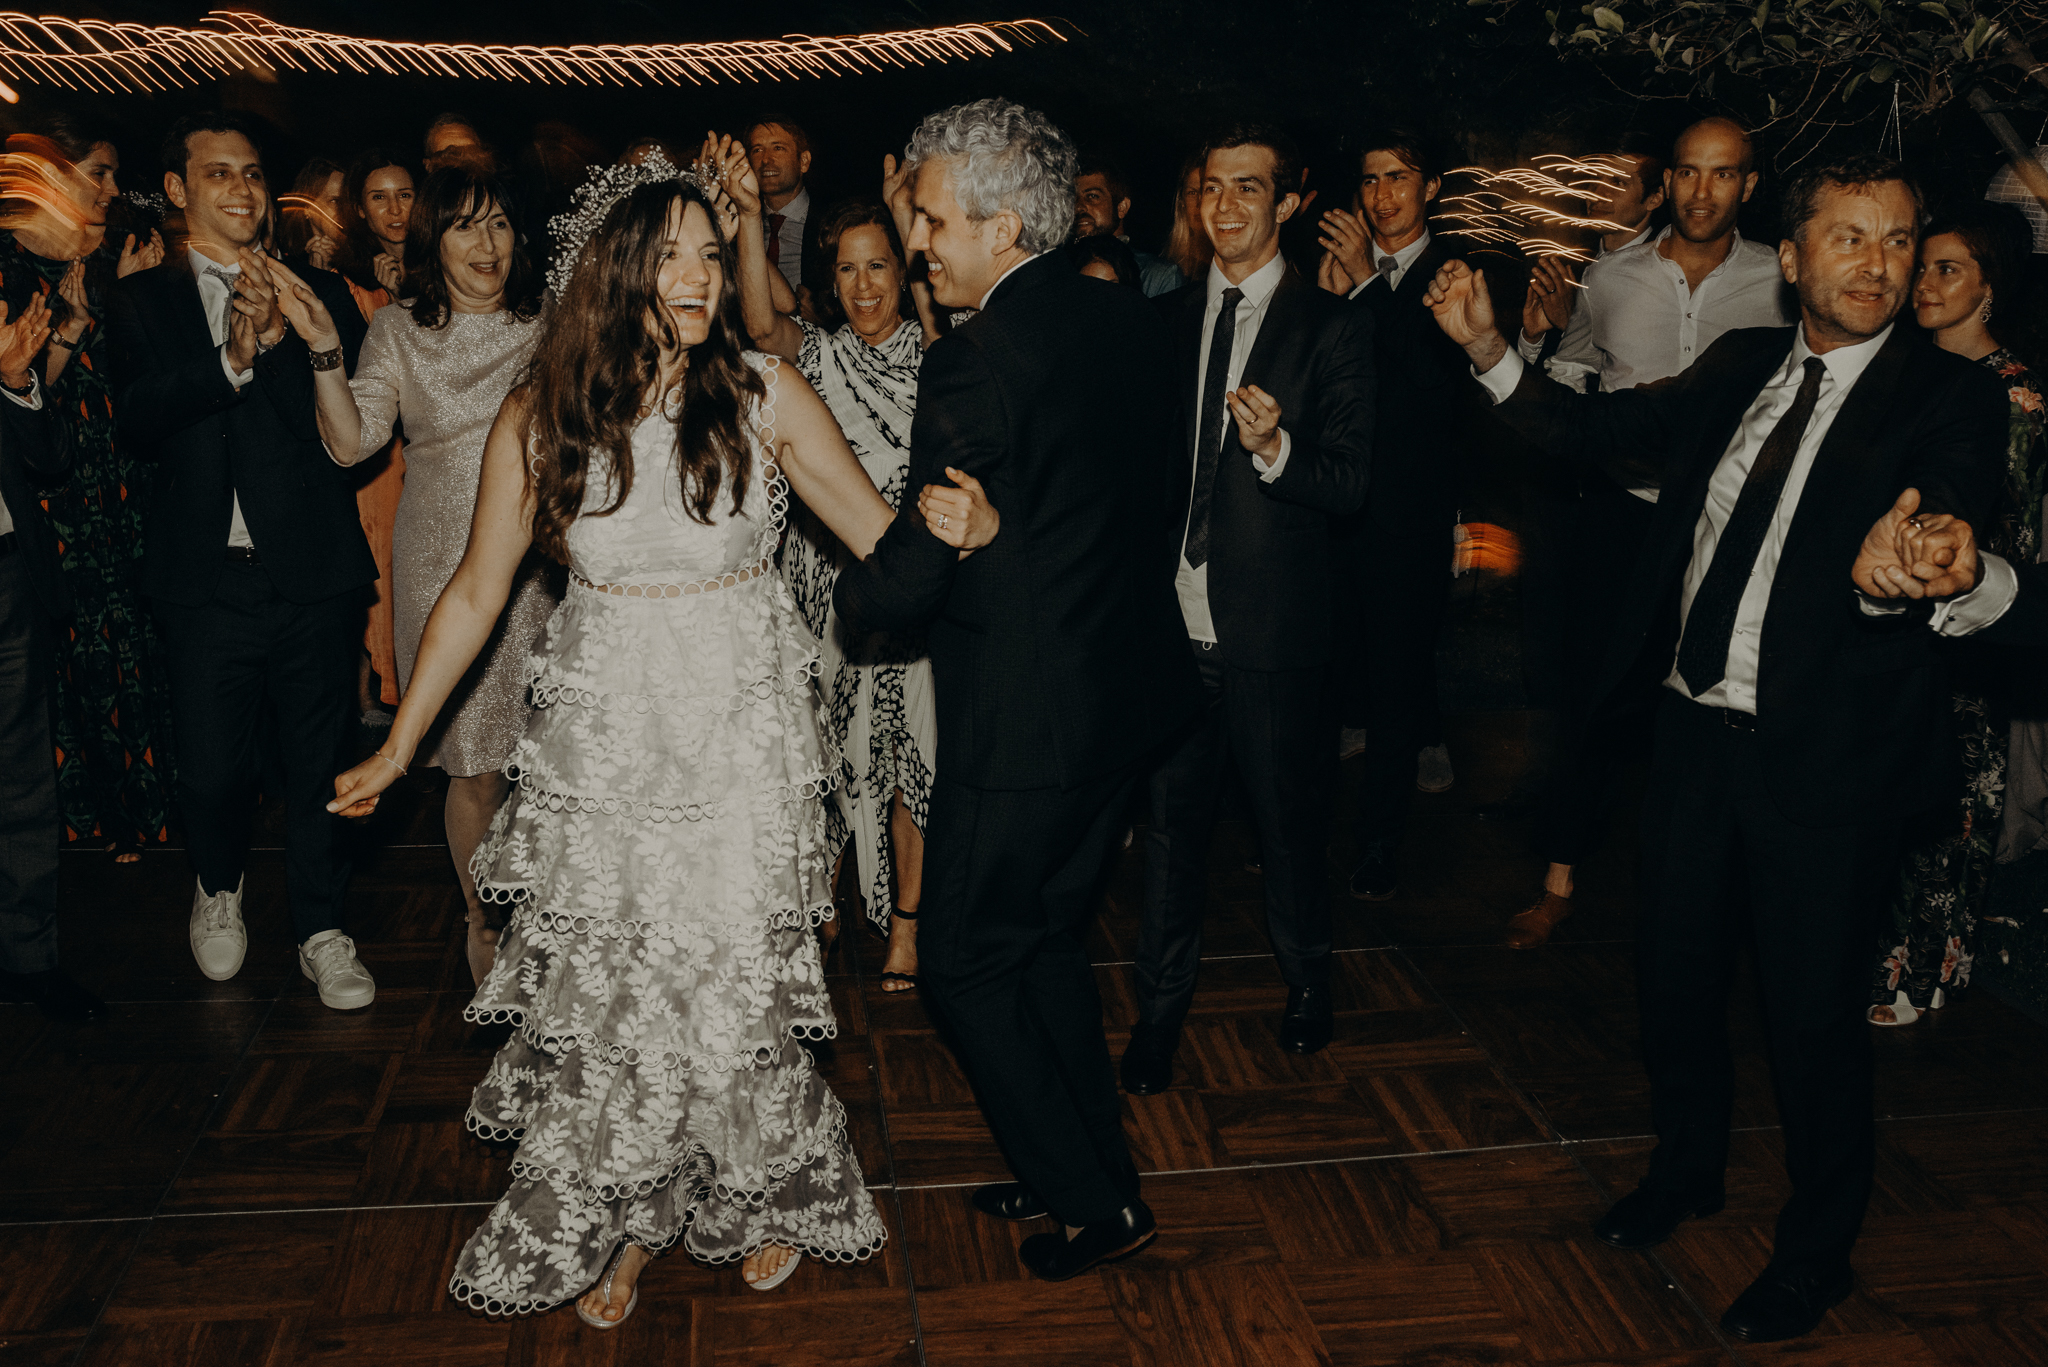 Isaiah + Taylor Photography - Private Estate Backyard Wedding - Beverly Hills - Los Angeles Wedding Photographer - 153.jpg